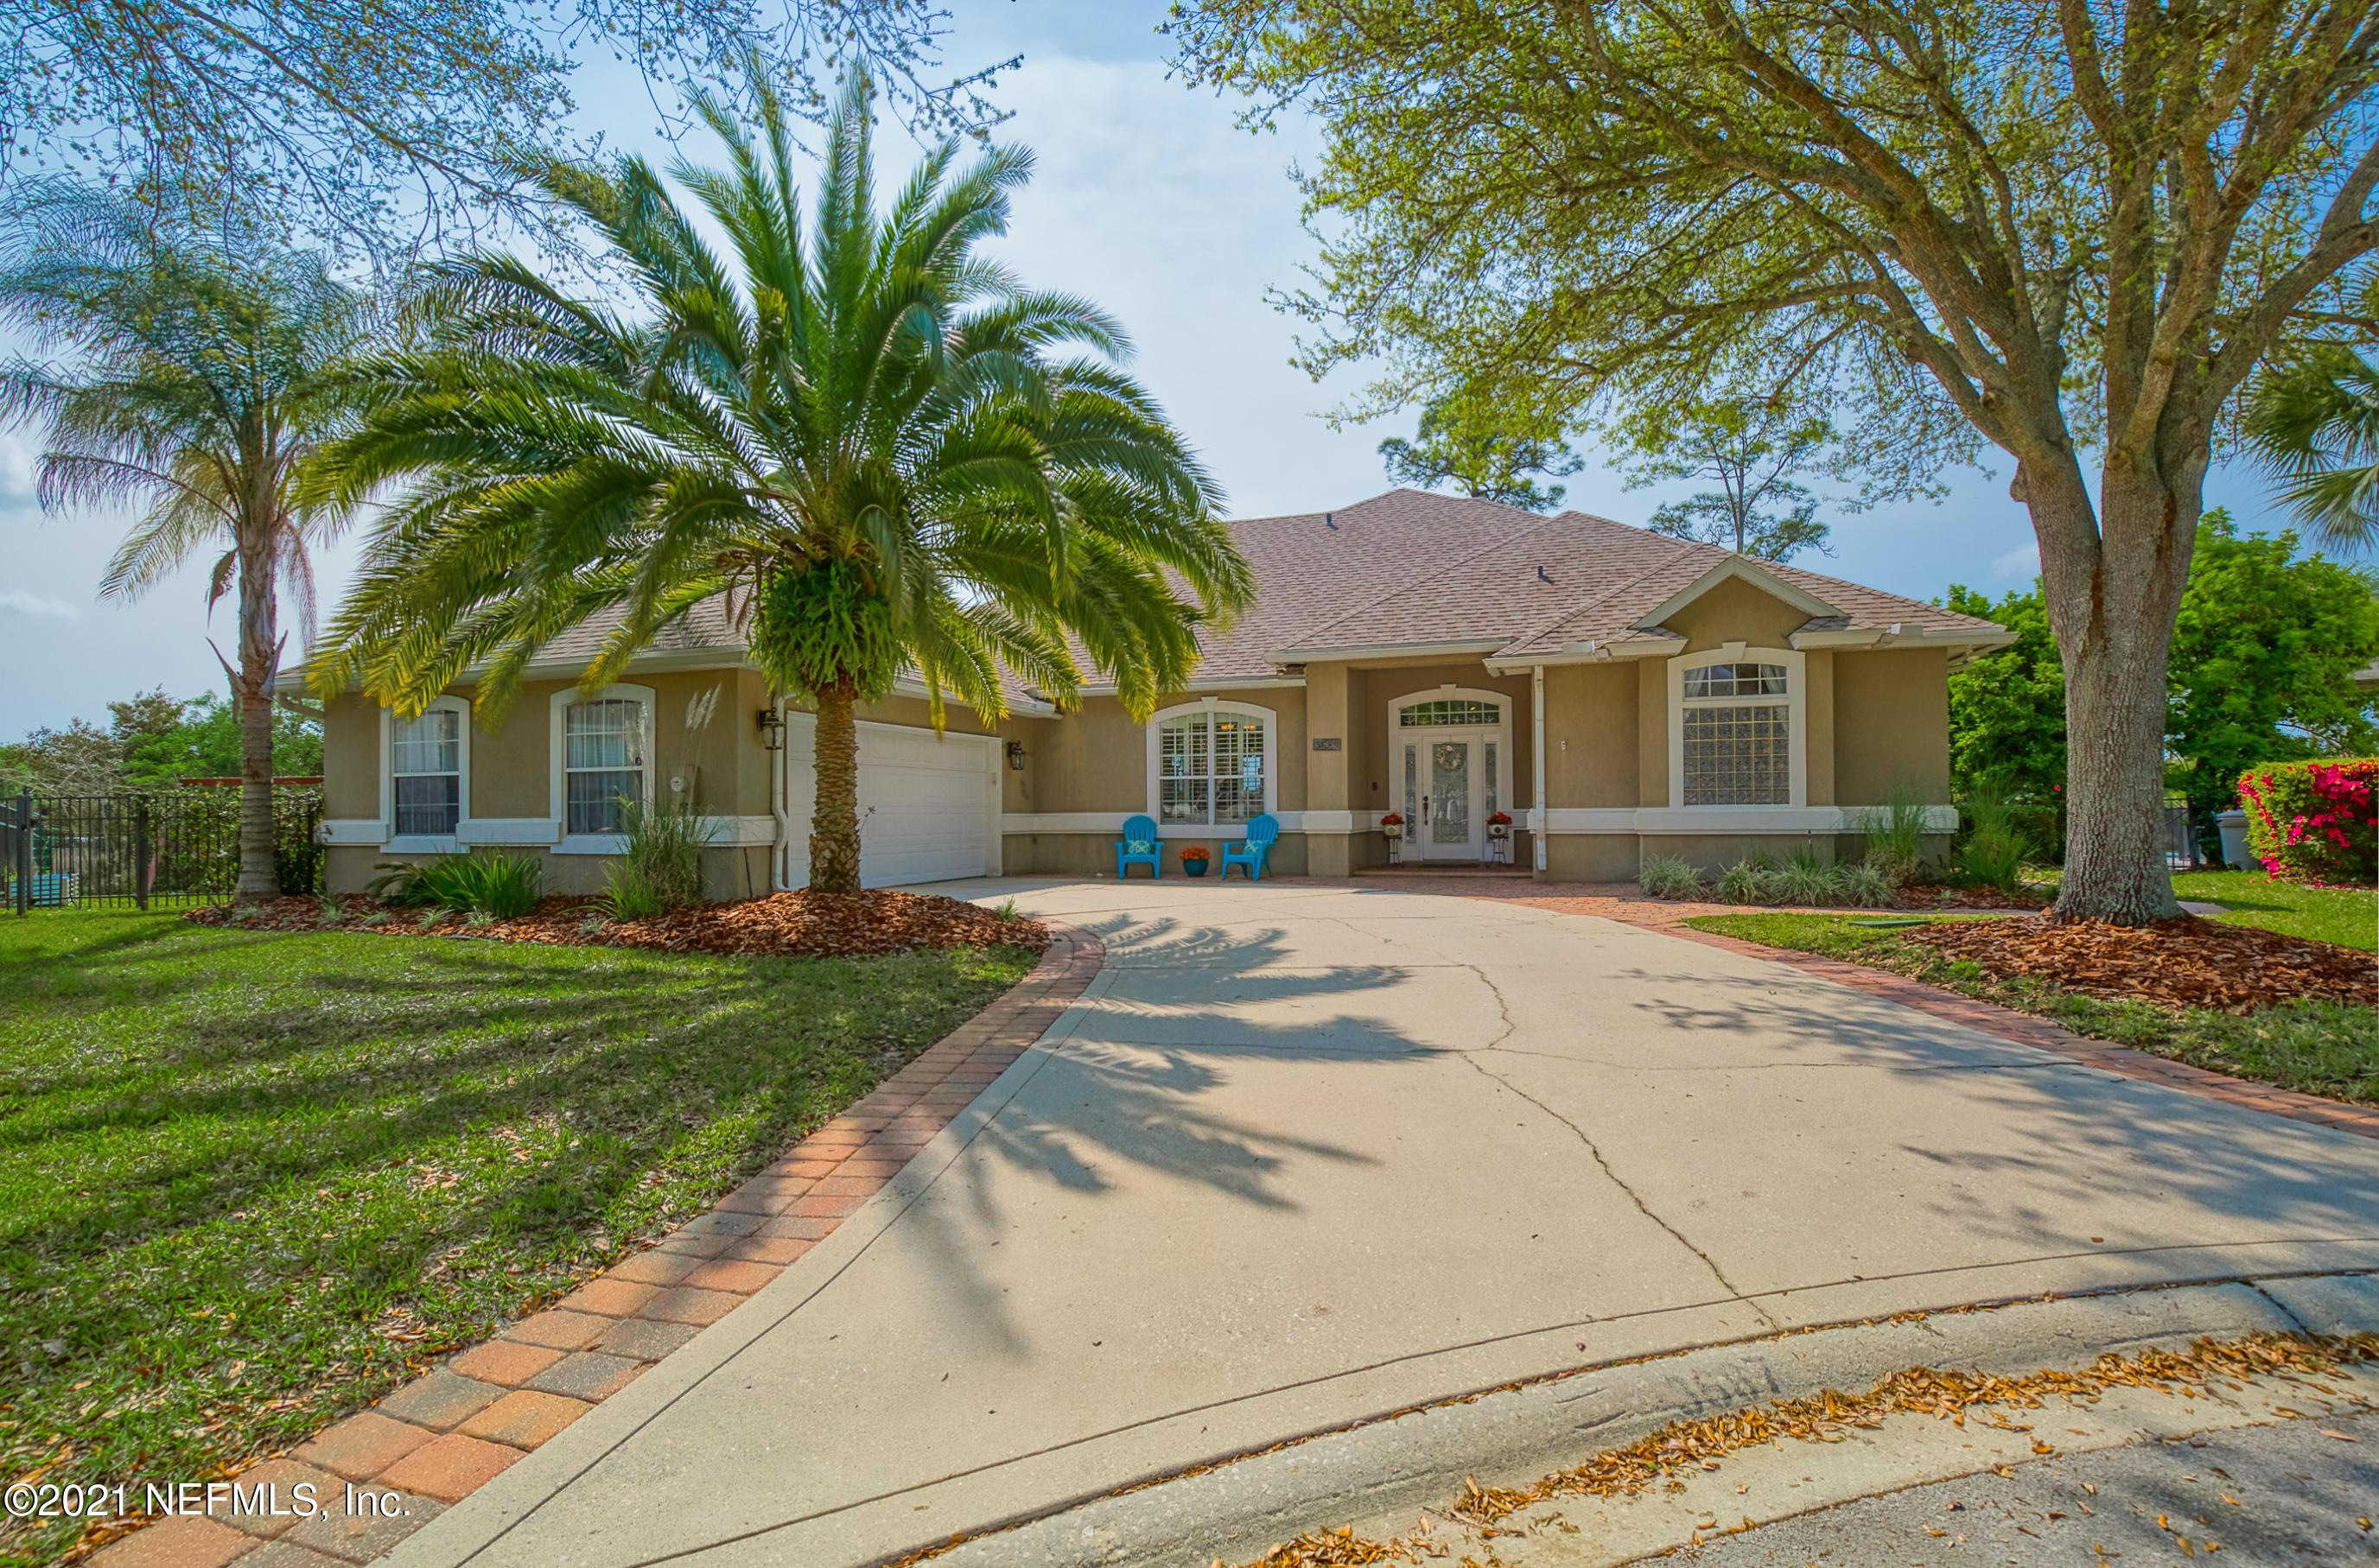 3687 MARSH PARK CT, JACKSONVILLE BEACH, Florida 32250, 4 Bedrooms Bedrooms, ,3 BathroomsBathrooms,Single Family,For Sale,3687 MARSH PARK CT,1100359